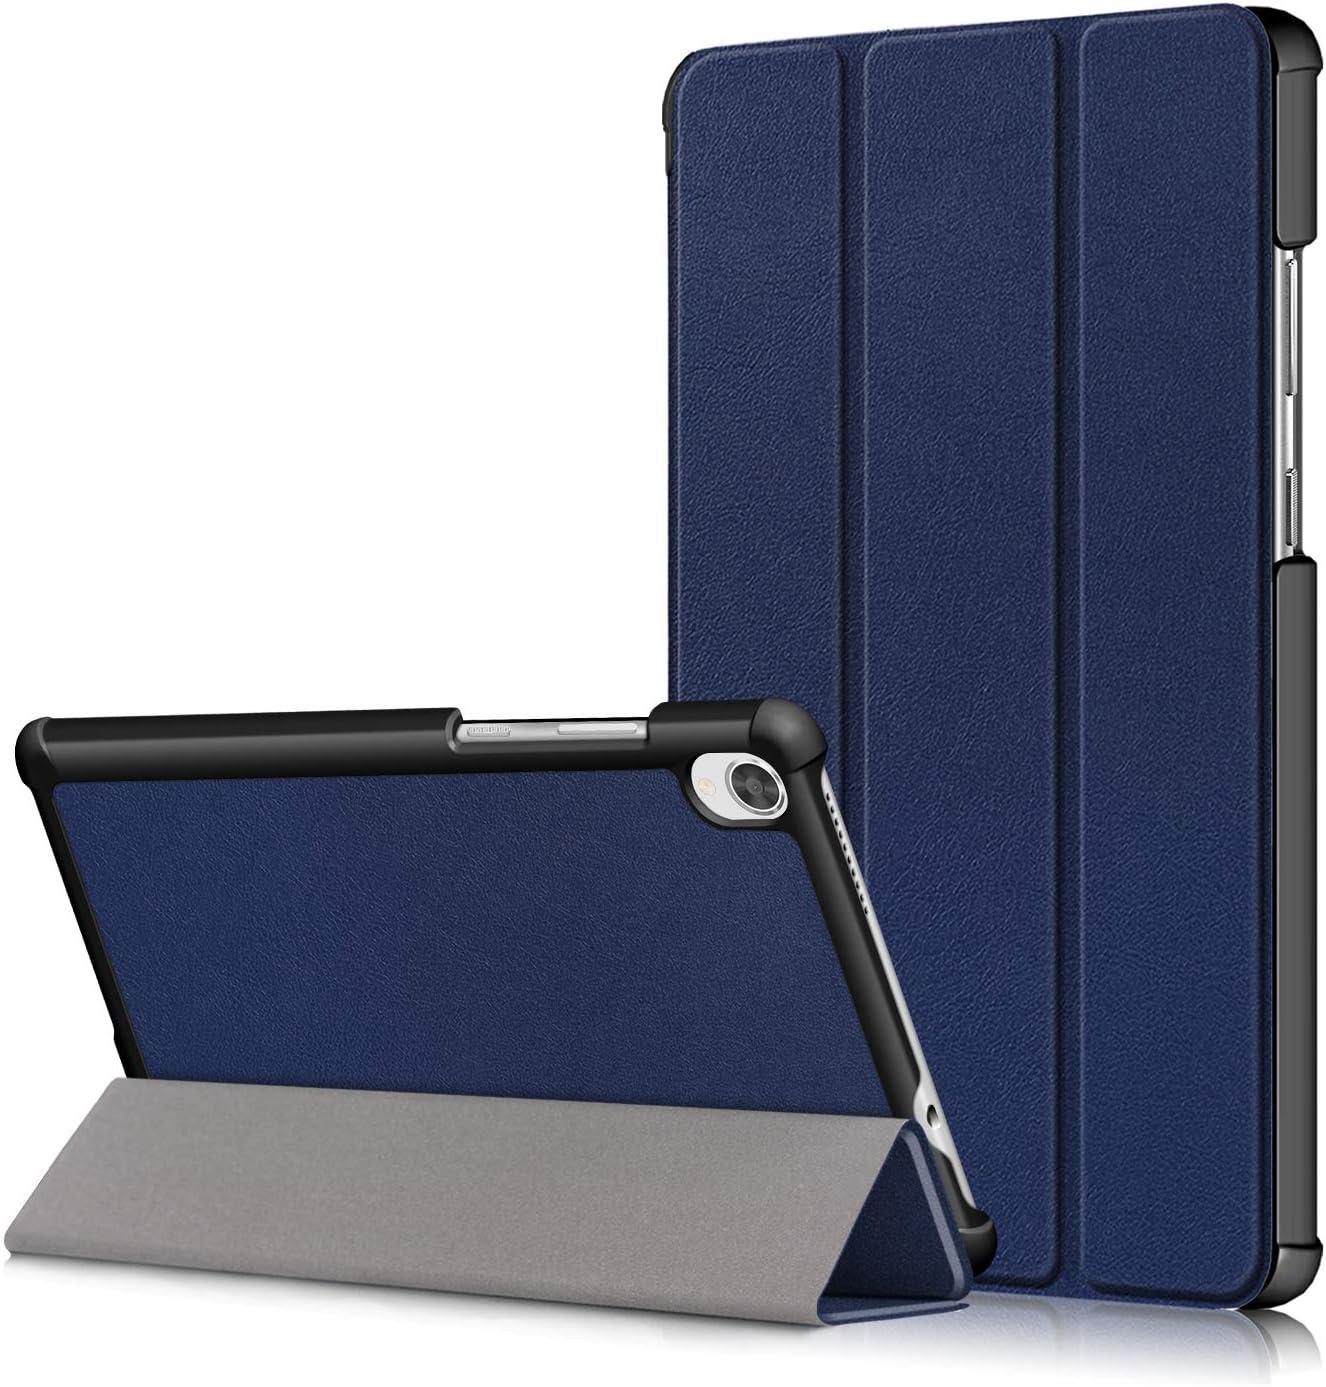 "Lenovo Tab M8 8.0"" Flip Cover,Tri-Fold Hard Kid Proof Cover PU Ultra Slim Smart Case with Protection Shell Shockproof Bumper for Lenovo Tab M8 FHD TB-8705F/X,Tab M8 HD TB-8505F/X Tablet (deep Blue)"